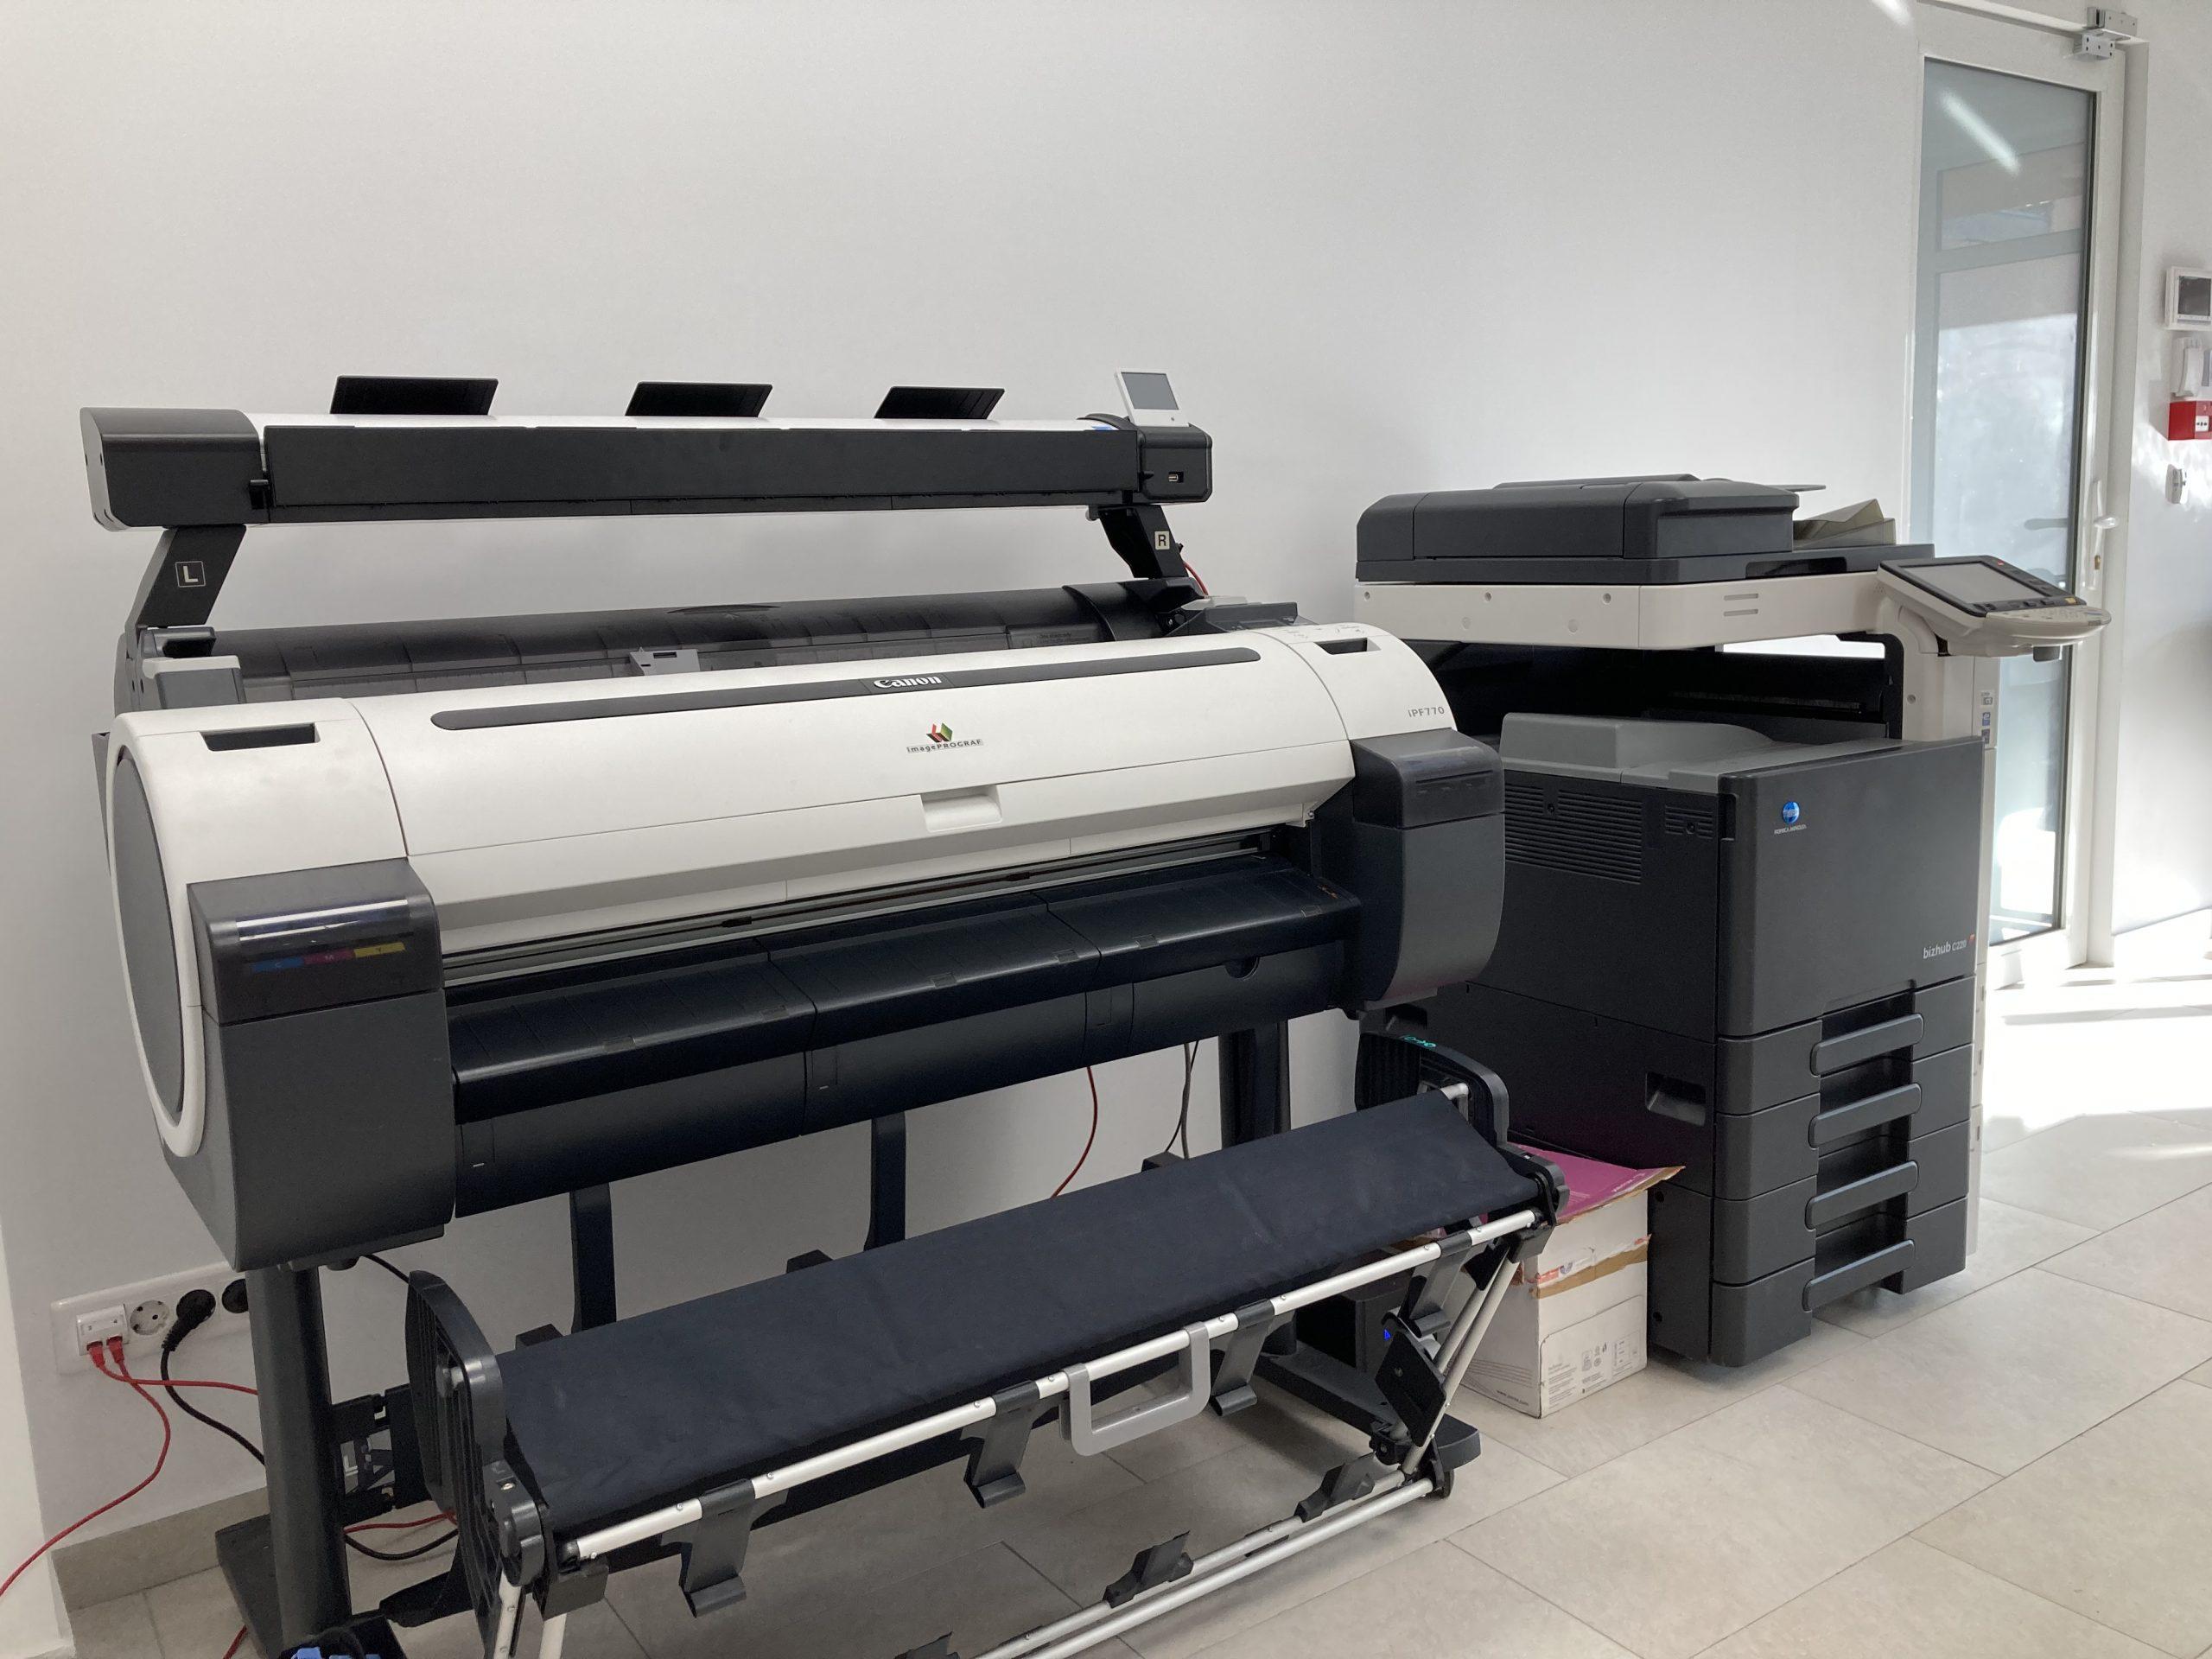 LYB Printare Belvedere Sector 6